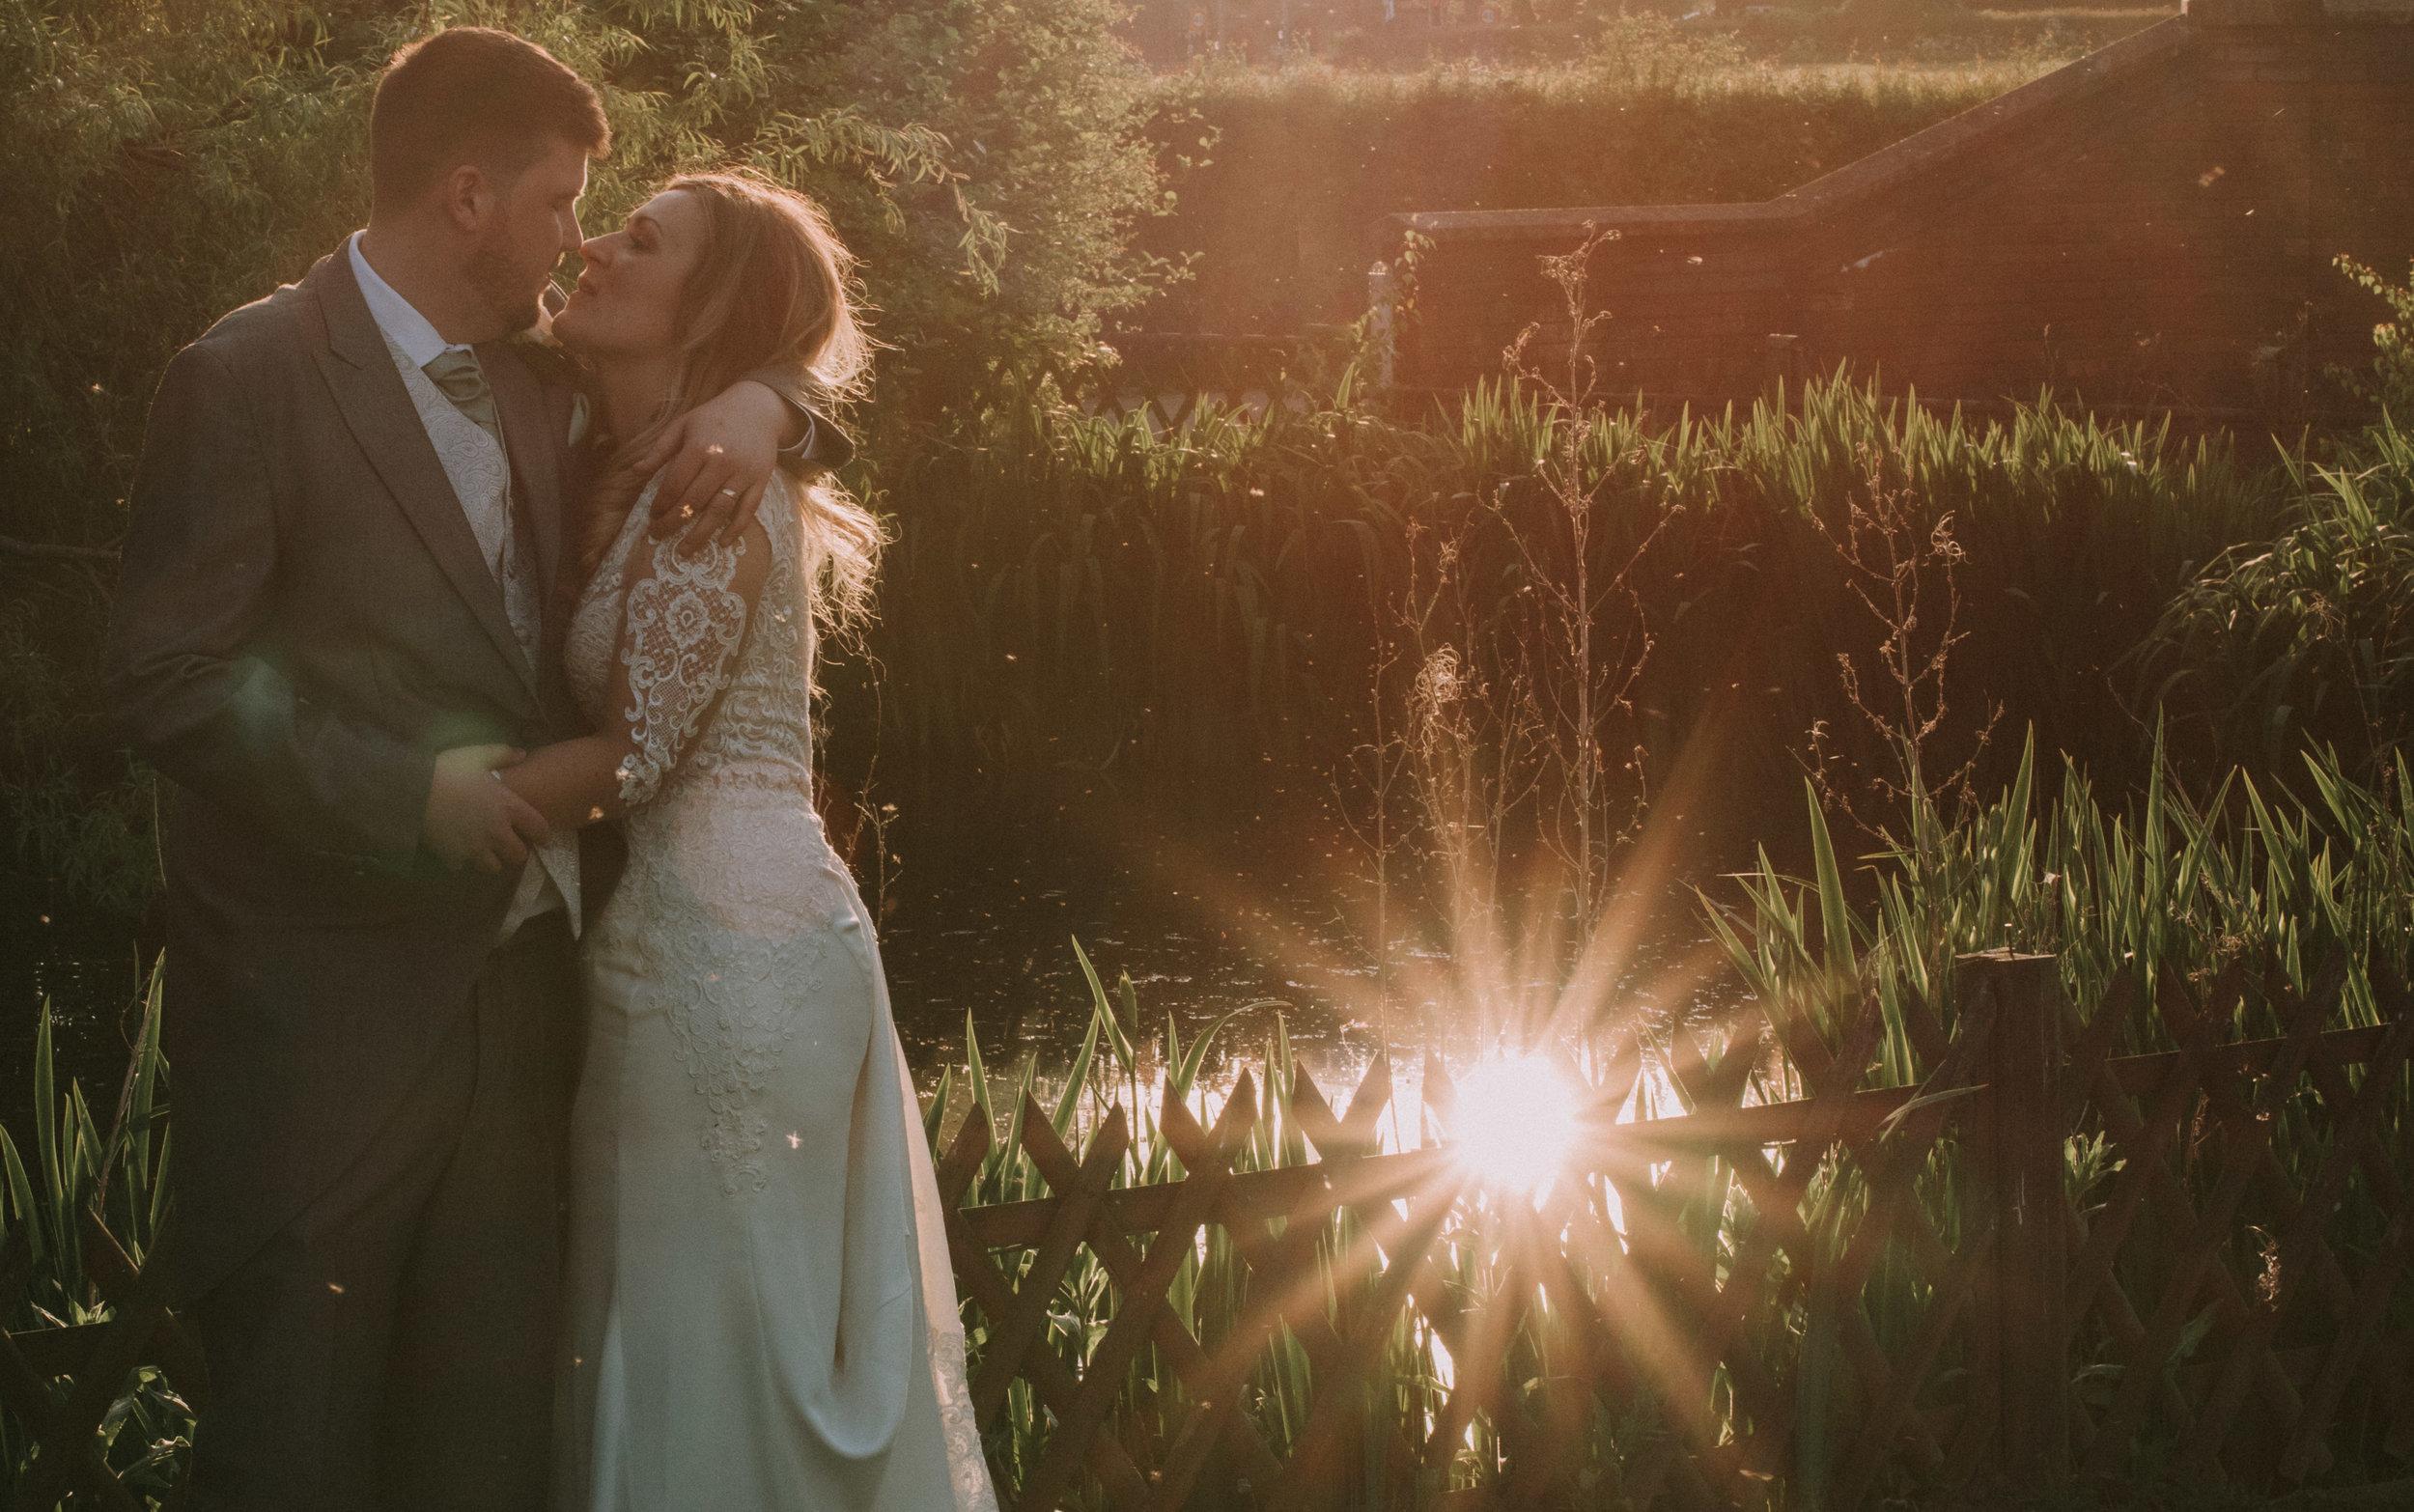 Cheshire wedding Photographer wedding photographer engagement photographer devon wedding photographer Shropshire wedding photographer  (1 of 1)-3.jpg